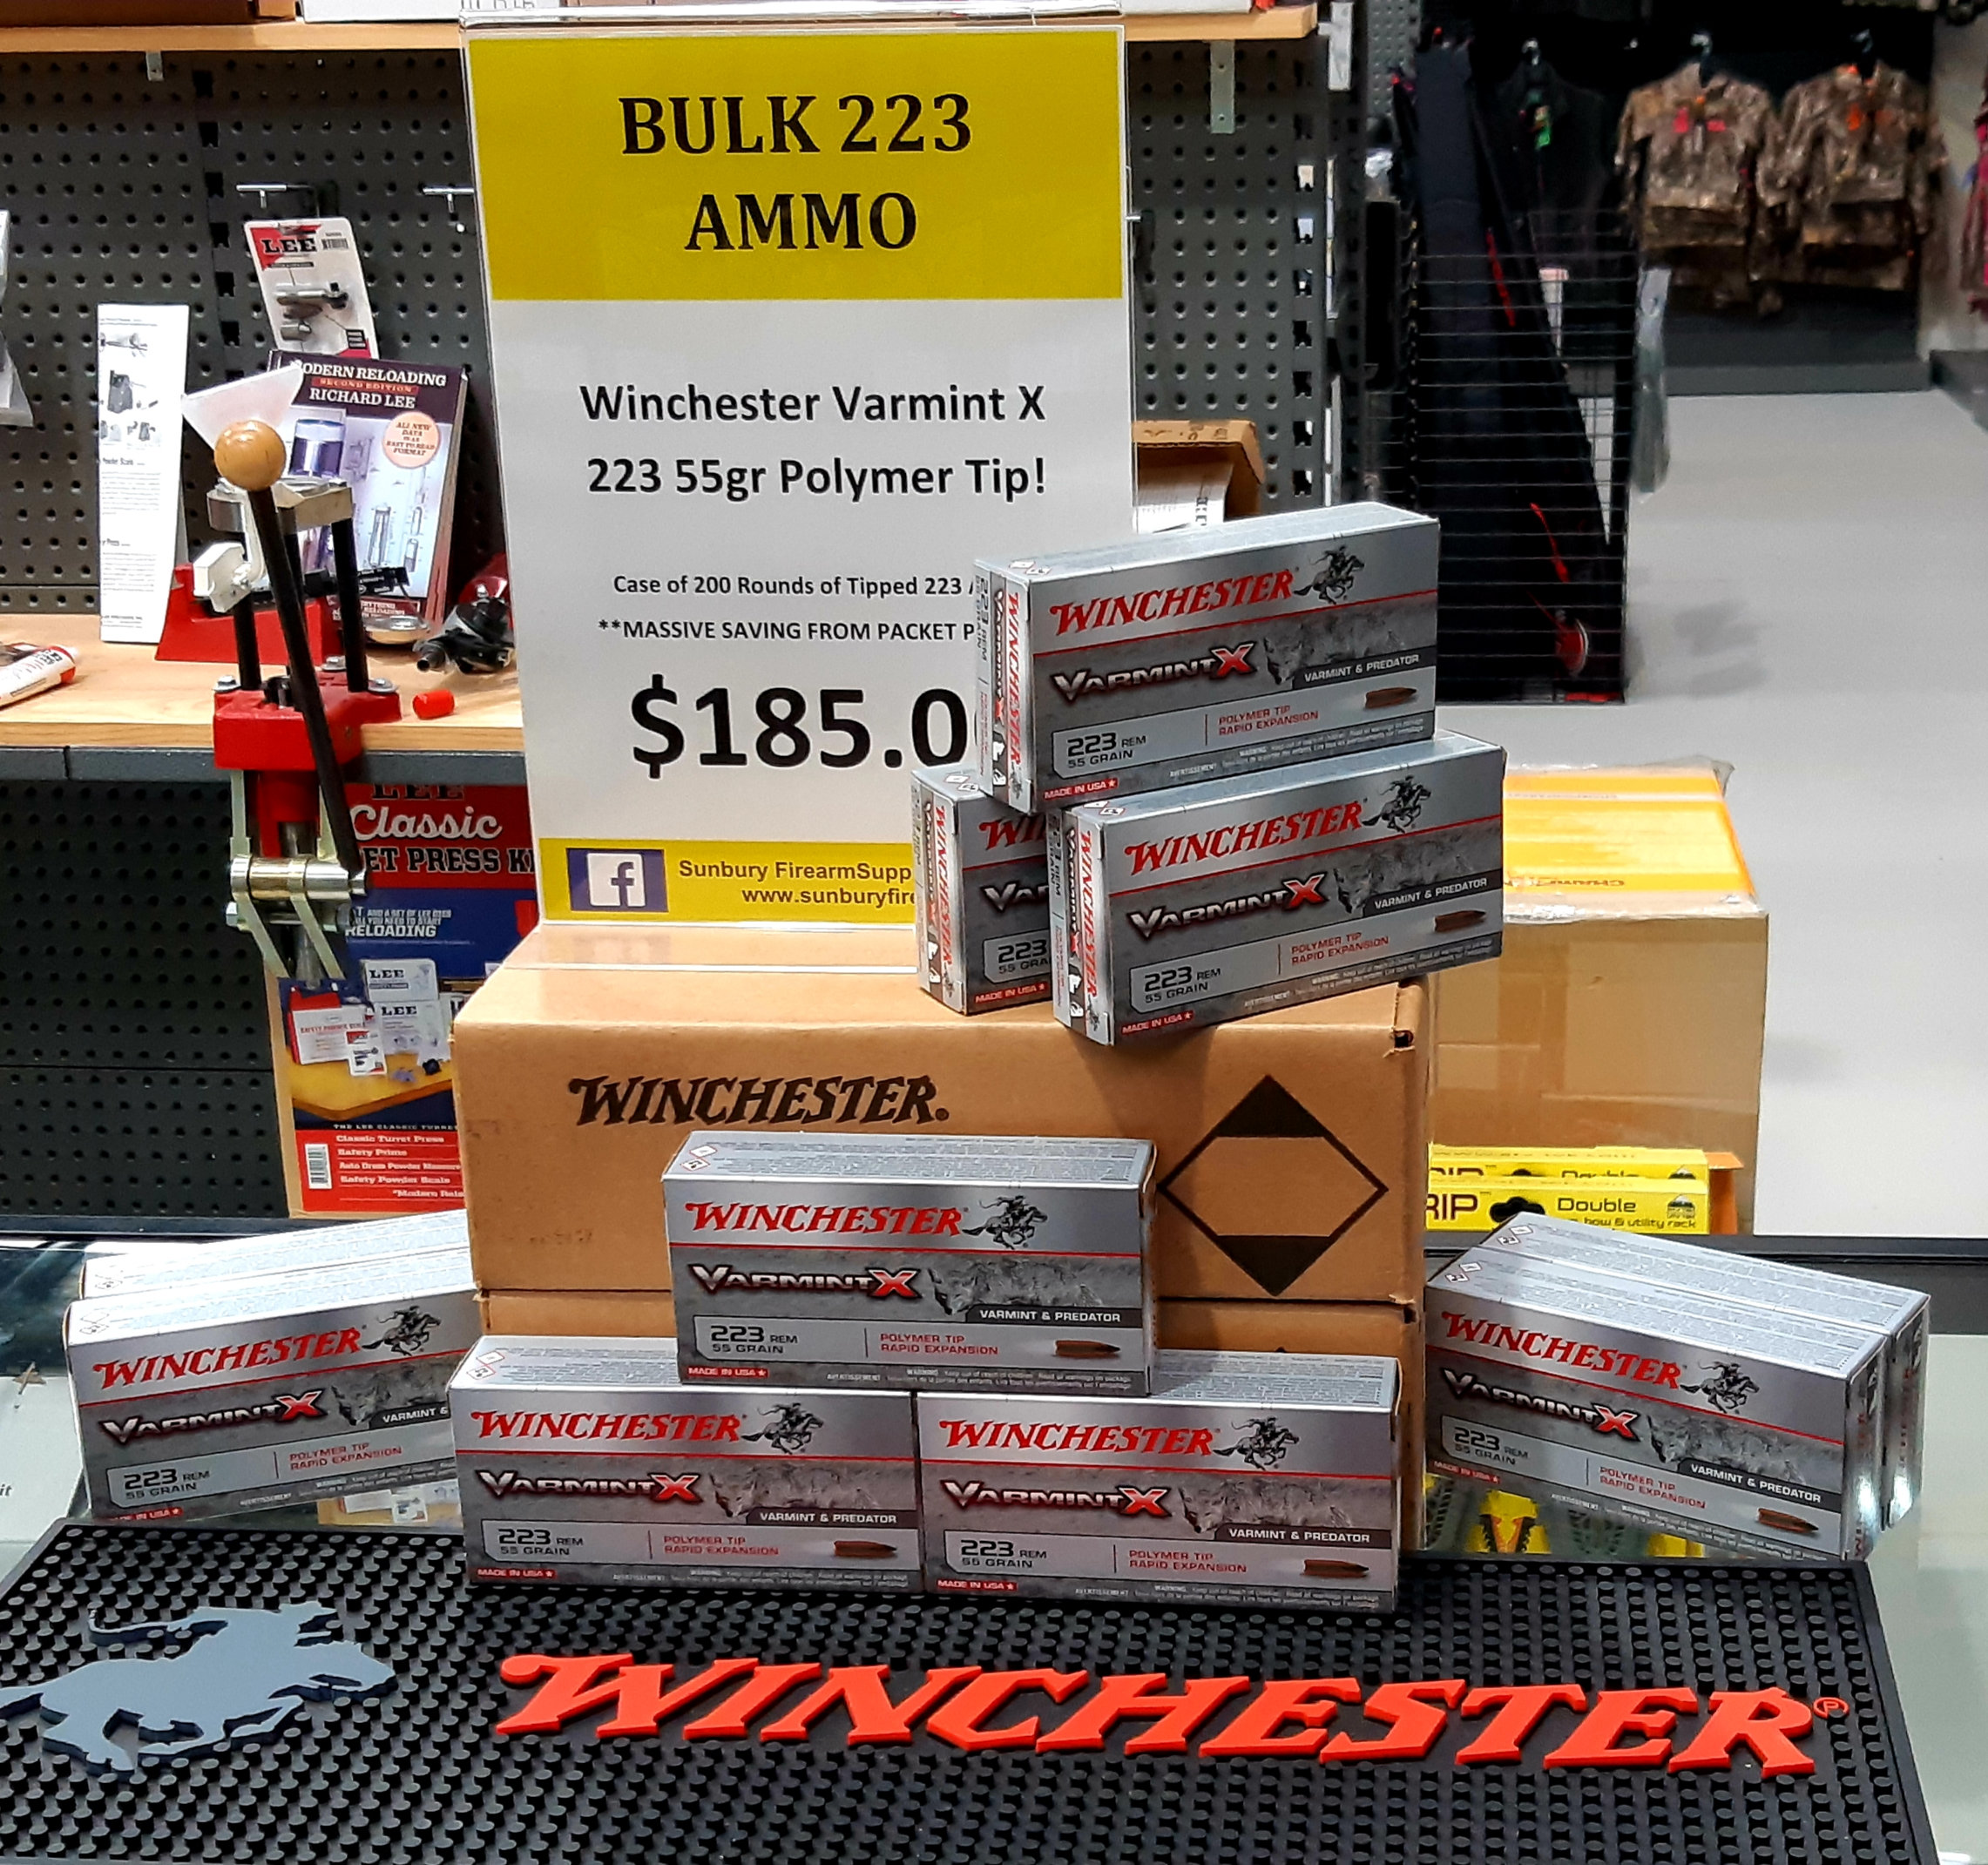 Winchester Varmint X  223 55gr Bulk Ammo